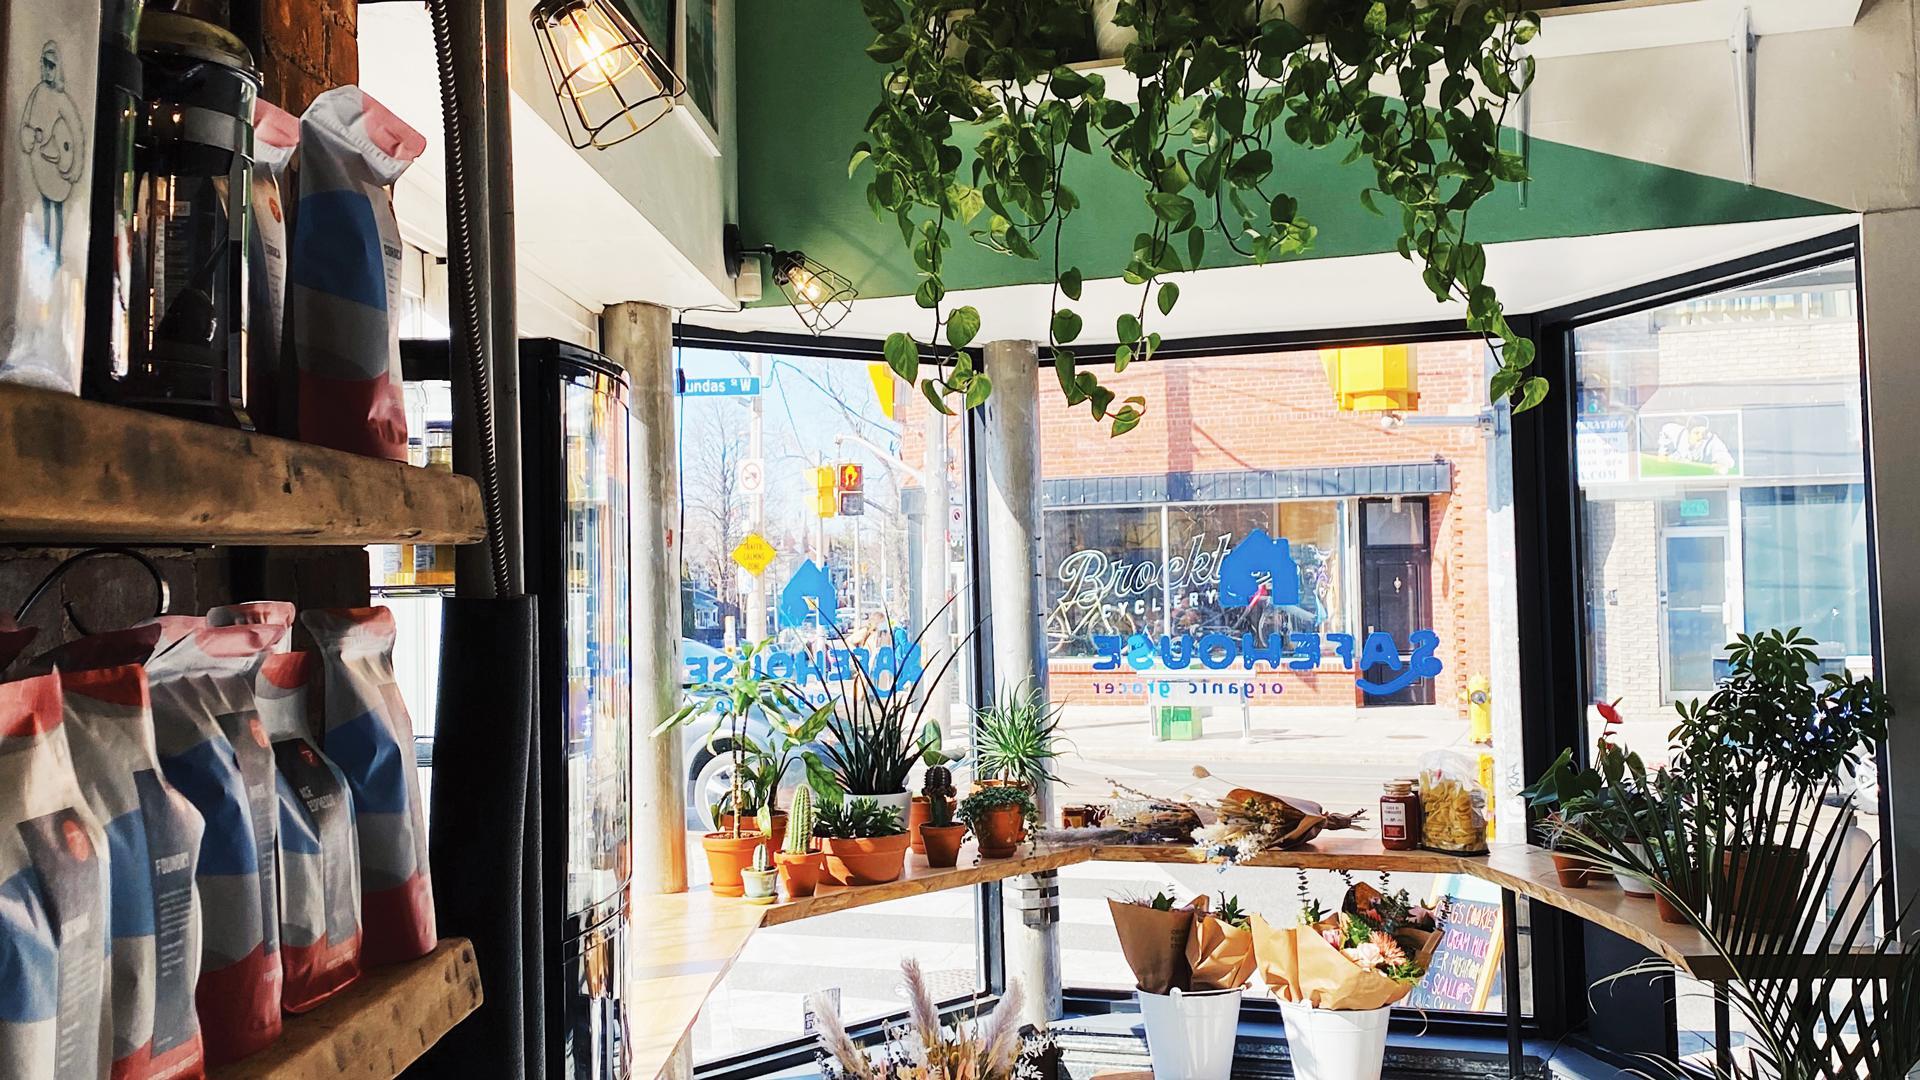 Safehouse Coffee, greengrocer, café, art shop and community hub | The interior of Safehouse Coffee